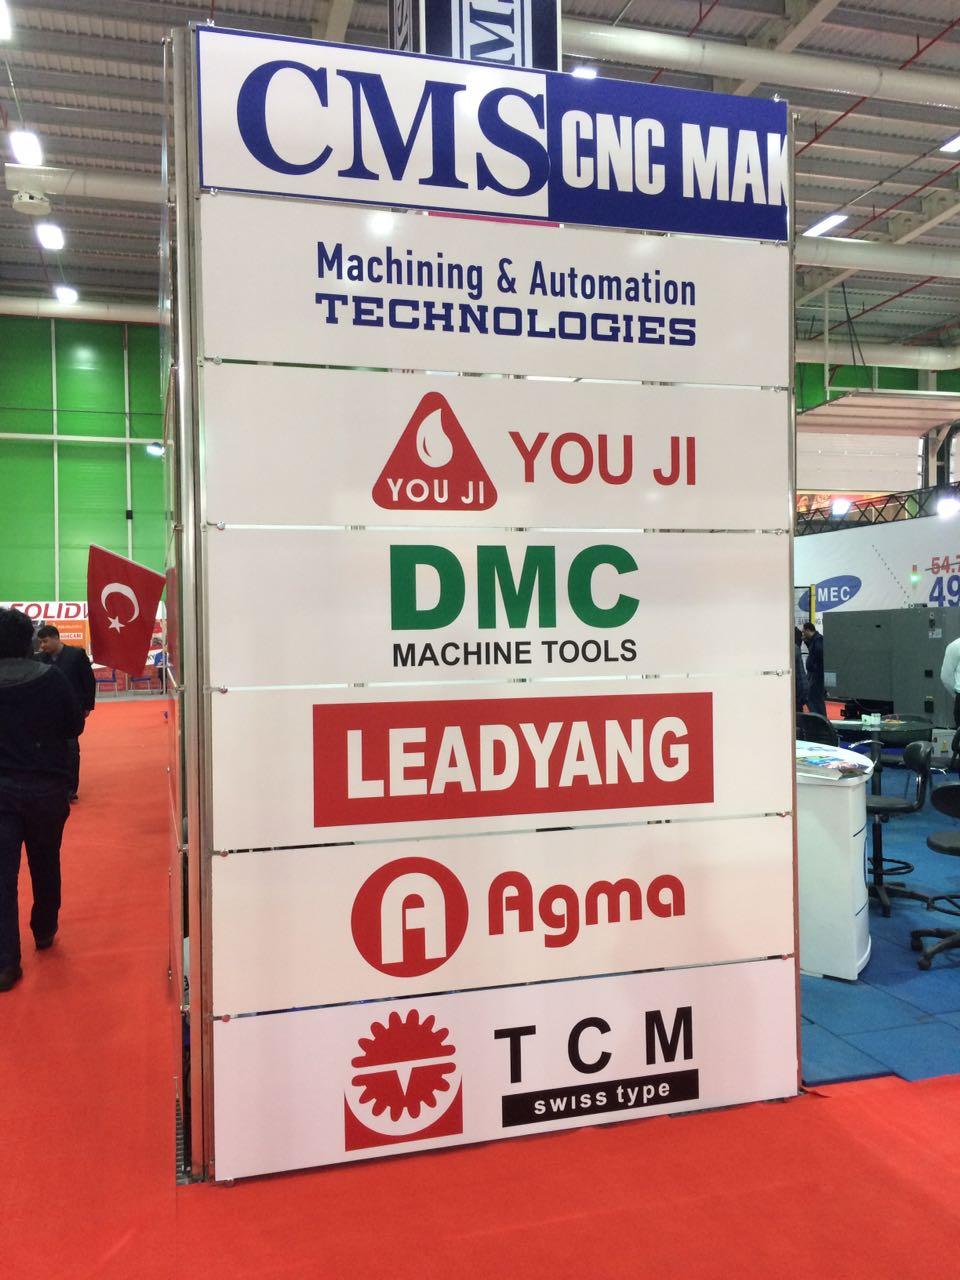 #konmak2017 #cmscncmakine cms cnc makine markalar